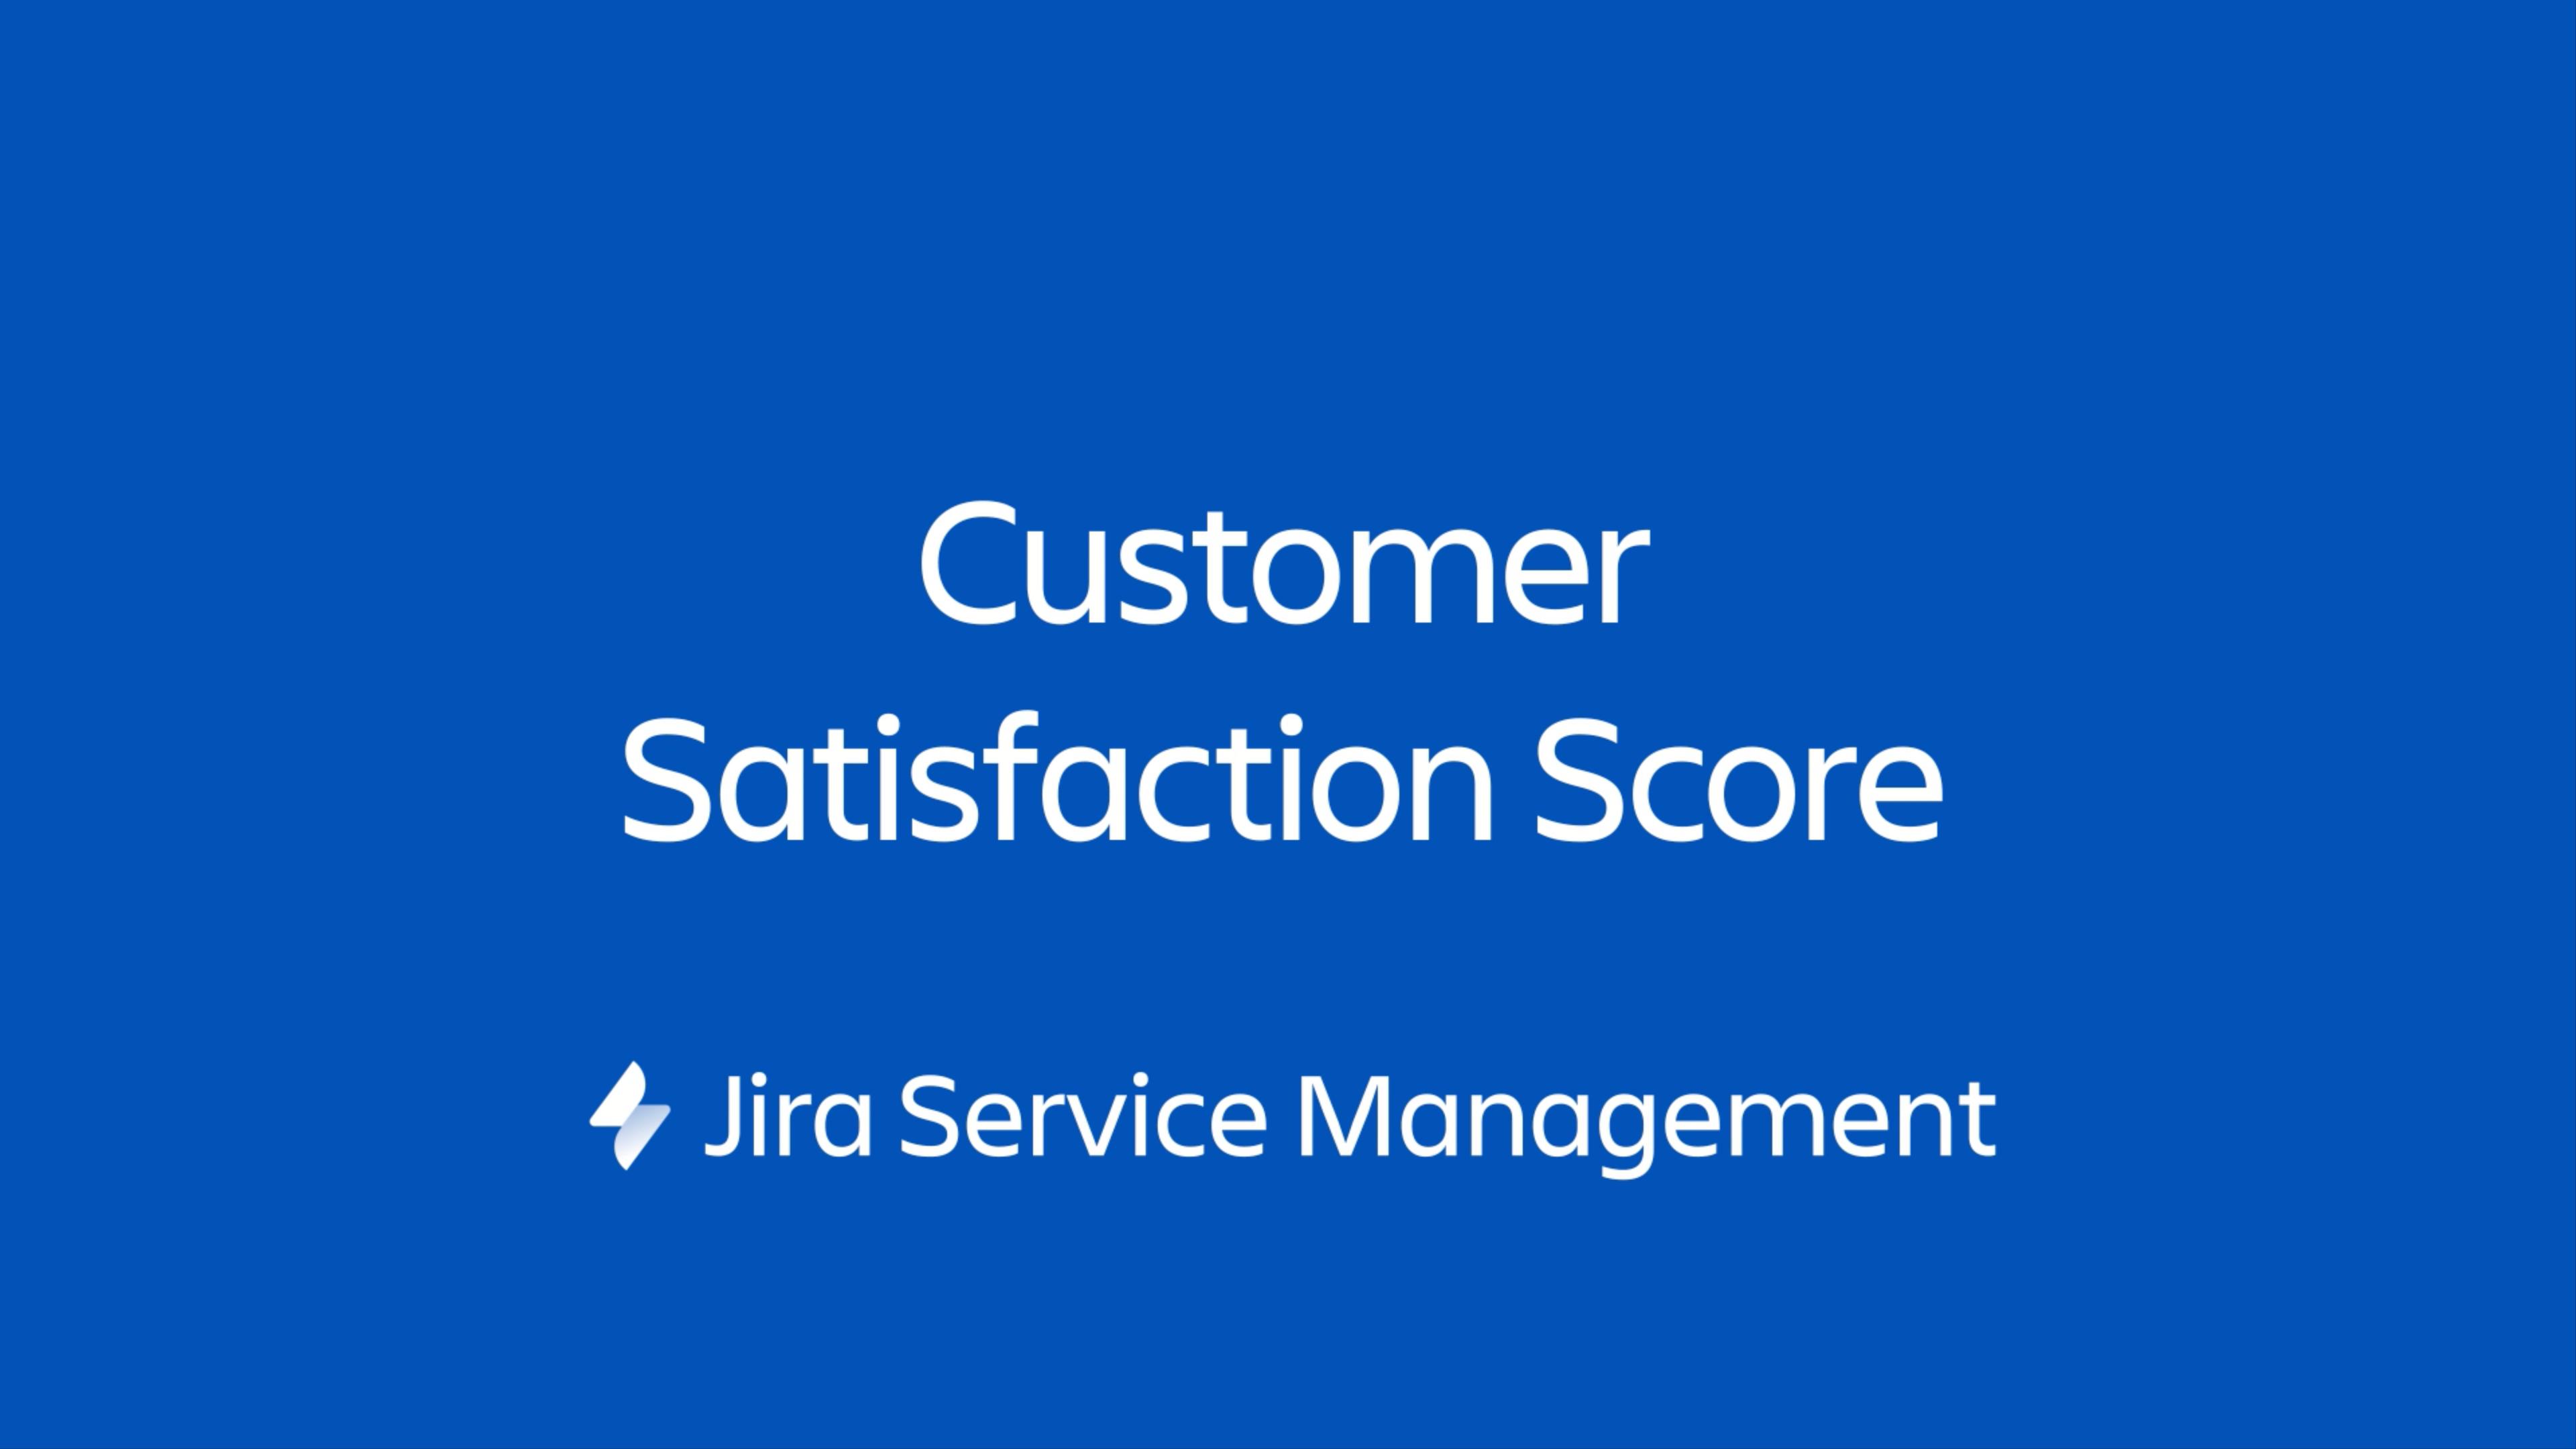 Jira Service Management 위젯은 사용자가 관리하는 모든 웹 페이지에 포함할 수 있는 미니 포털입니다.